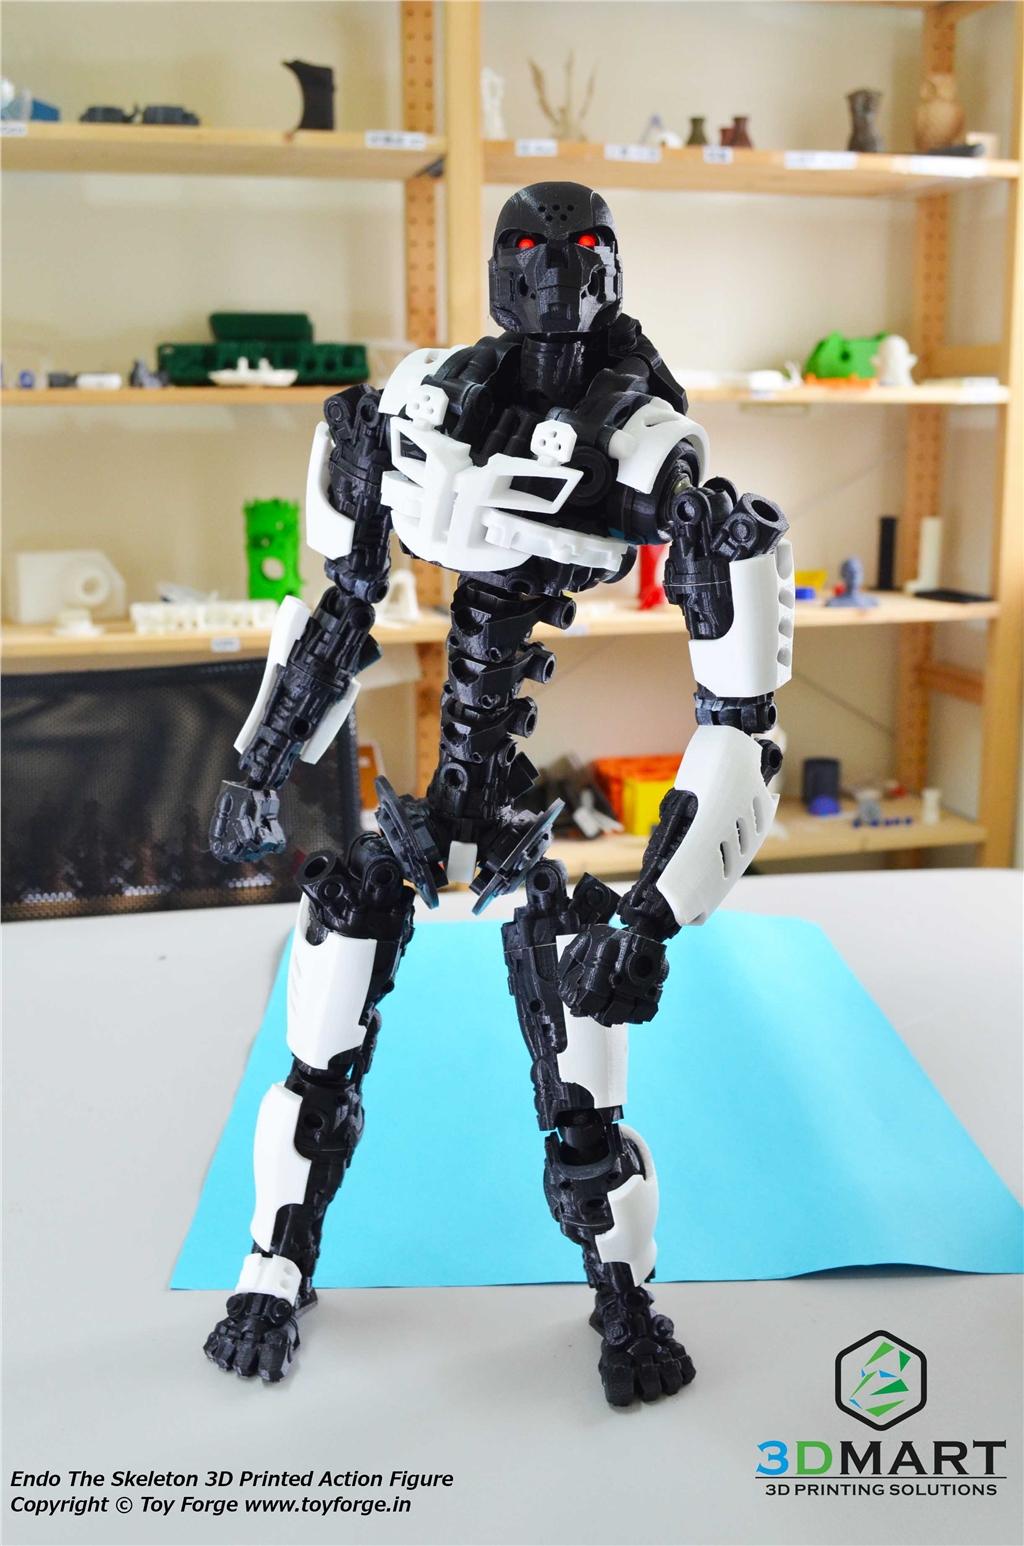 3D列印 骷髏機器人 ENDO 全身可動 可更換裝甲 3D印表機 Ultimaker2+